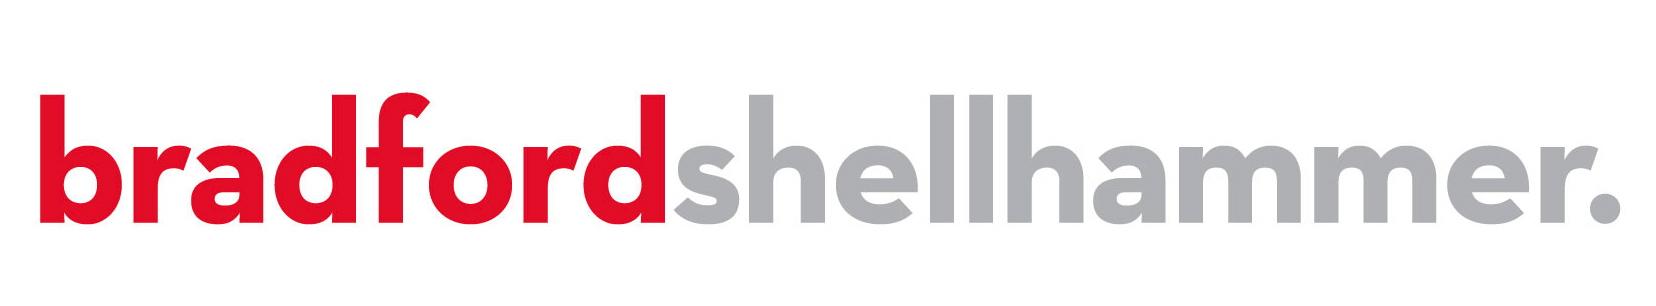 Bradford Shellhammer Blog